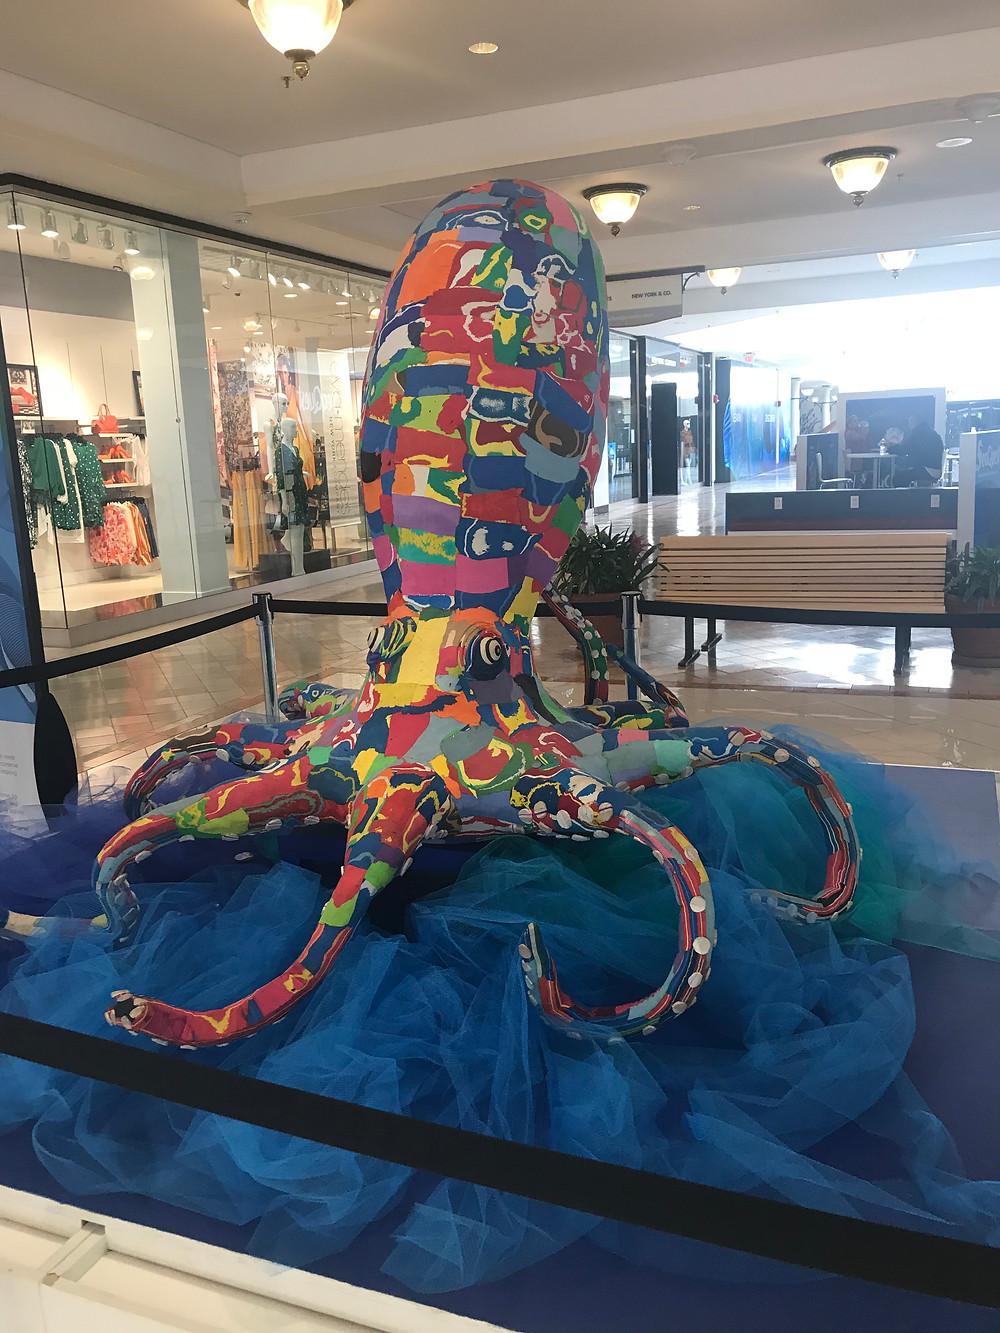 inky, octopus, seaquest, woodbridge mall